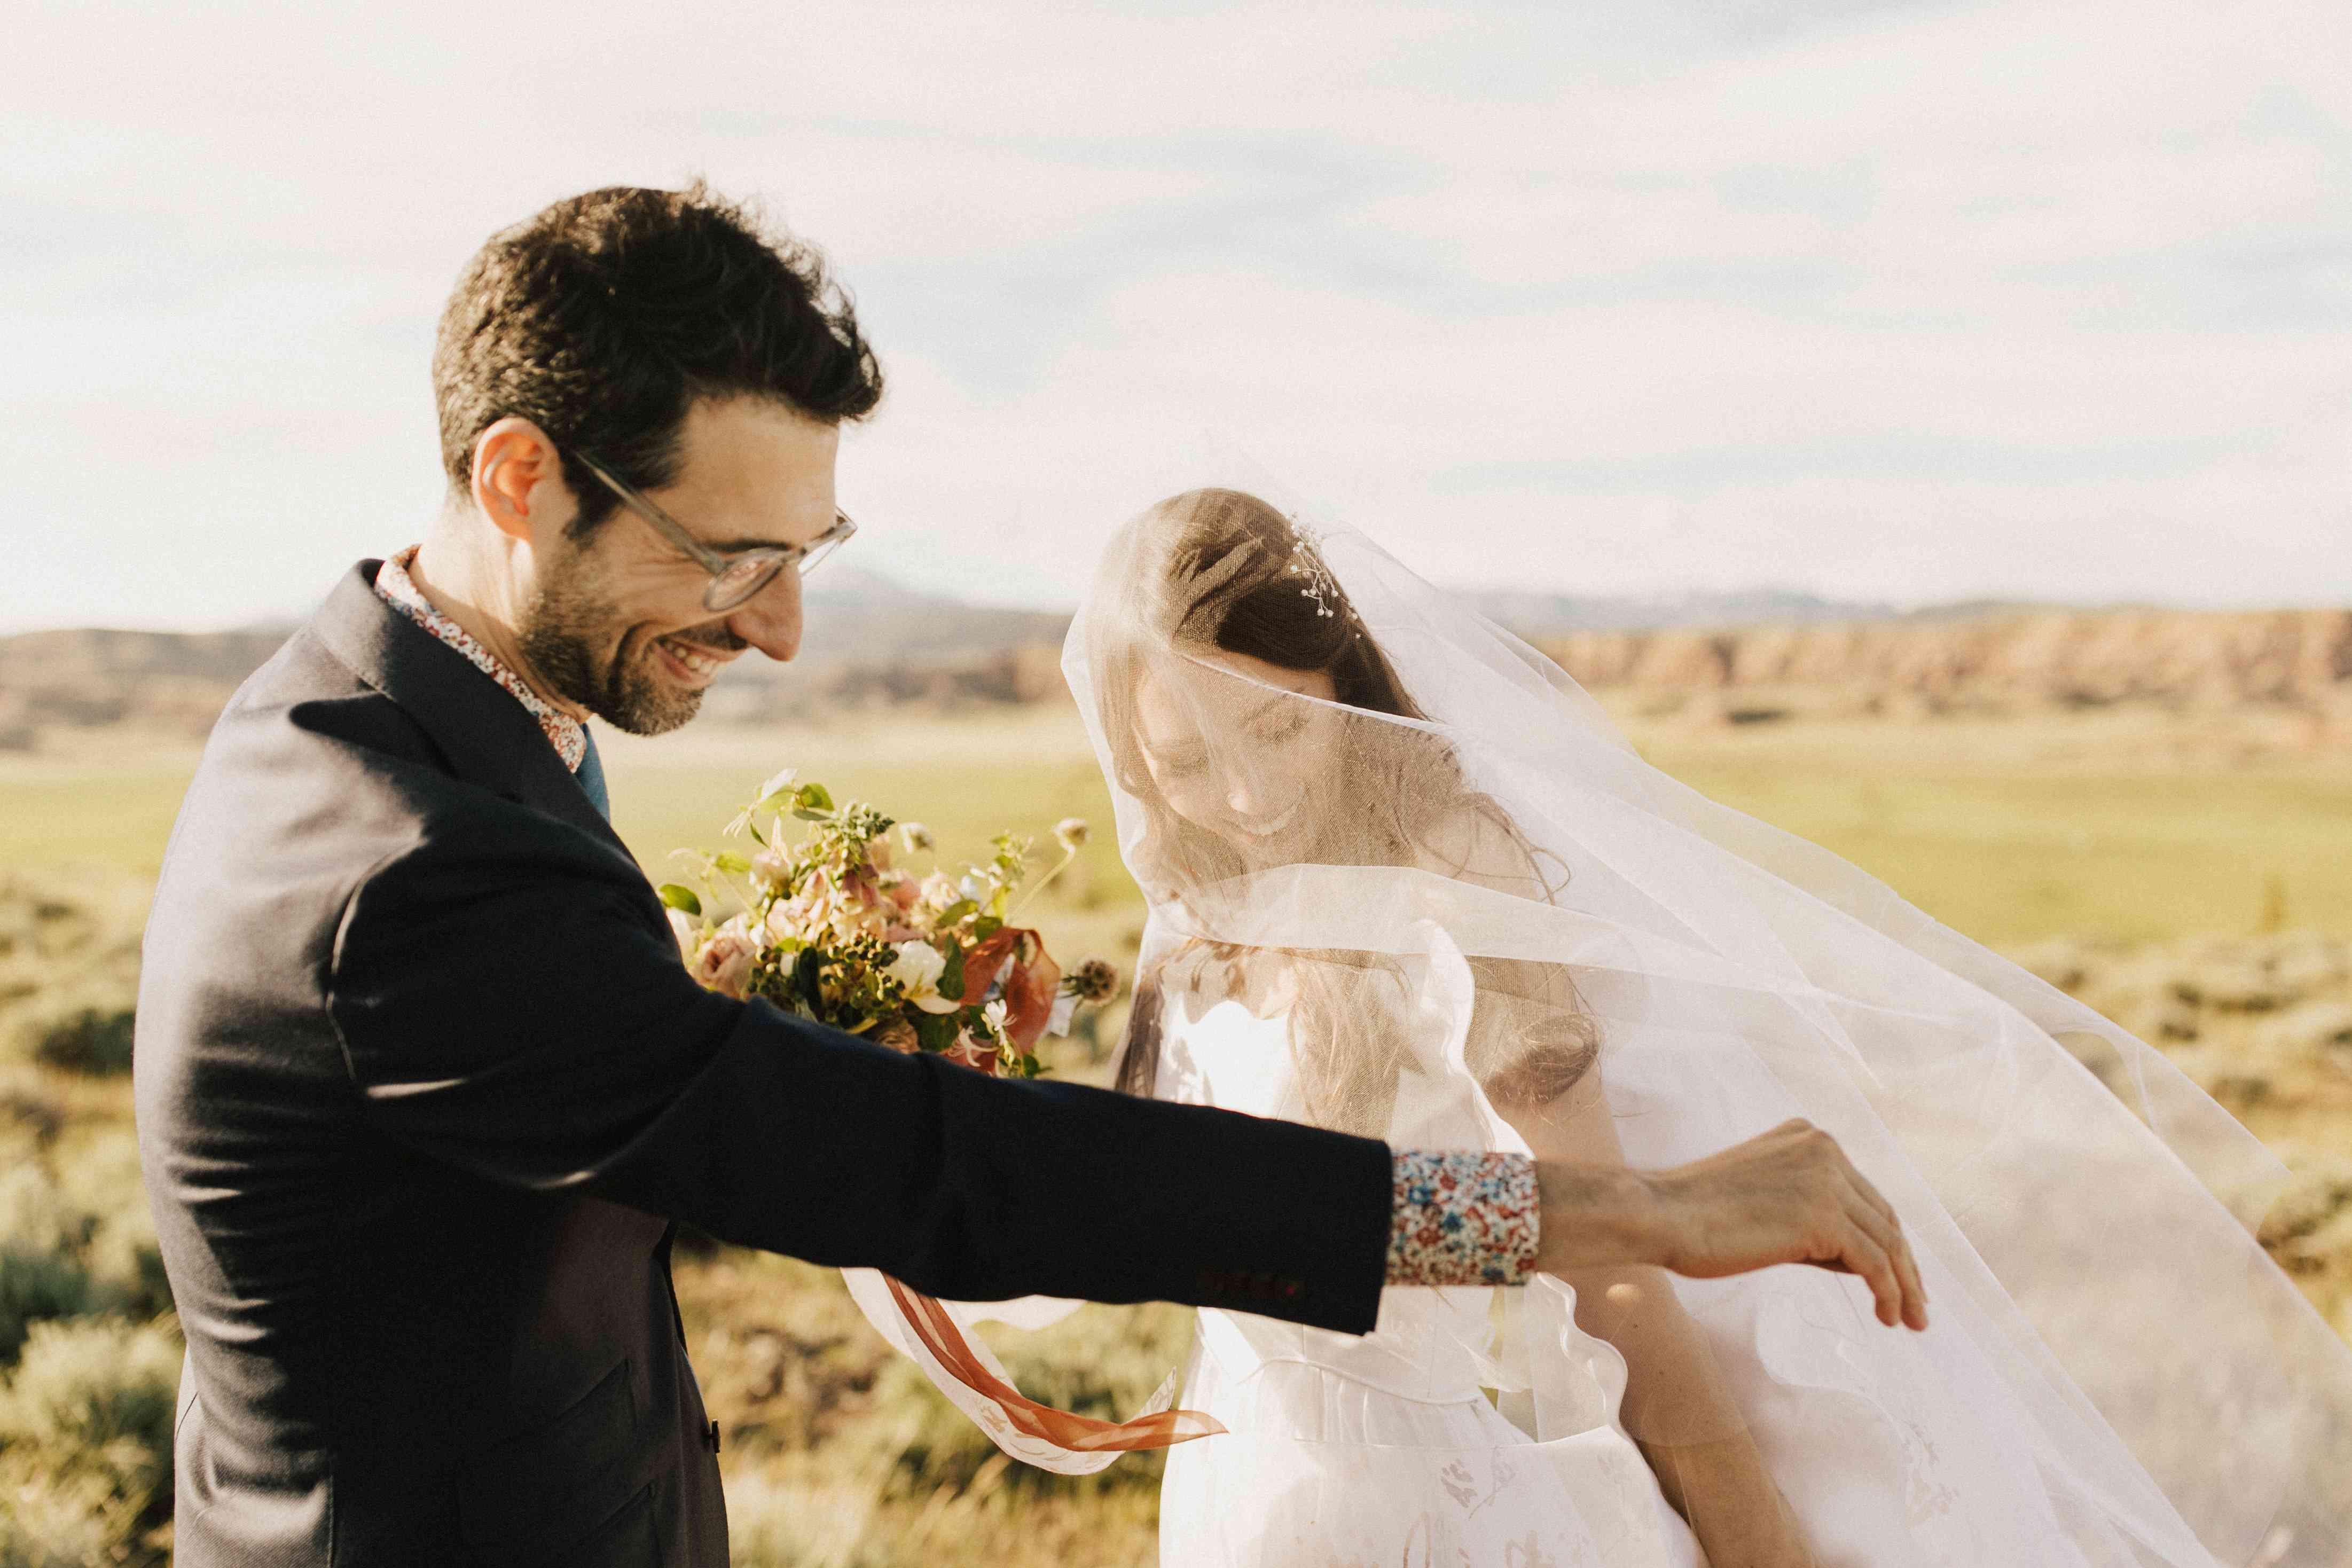 windy wedding veil blowing